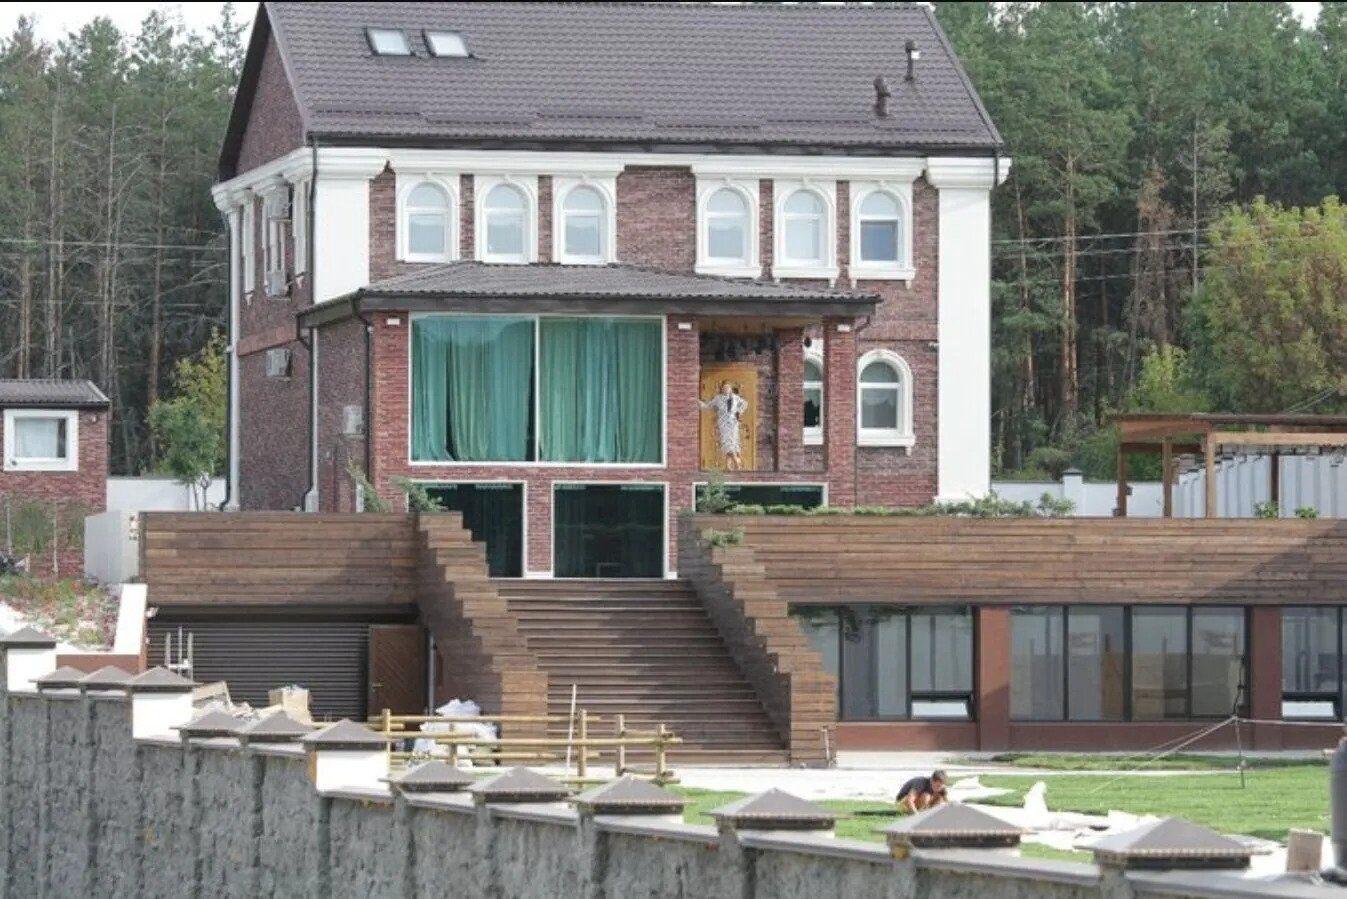 Будинок Тіни Кароль